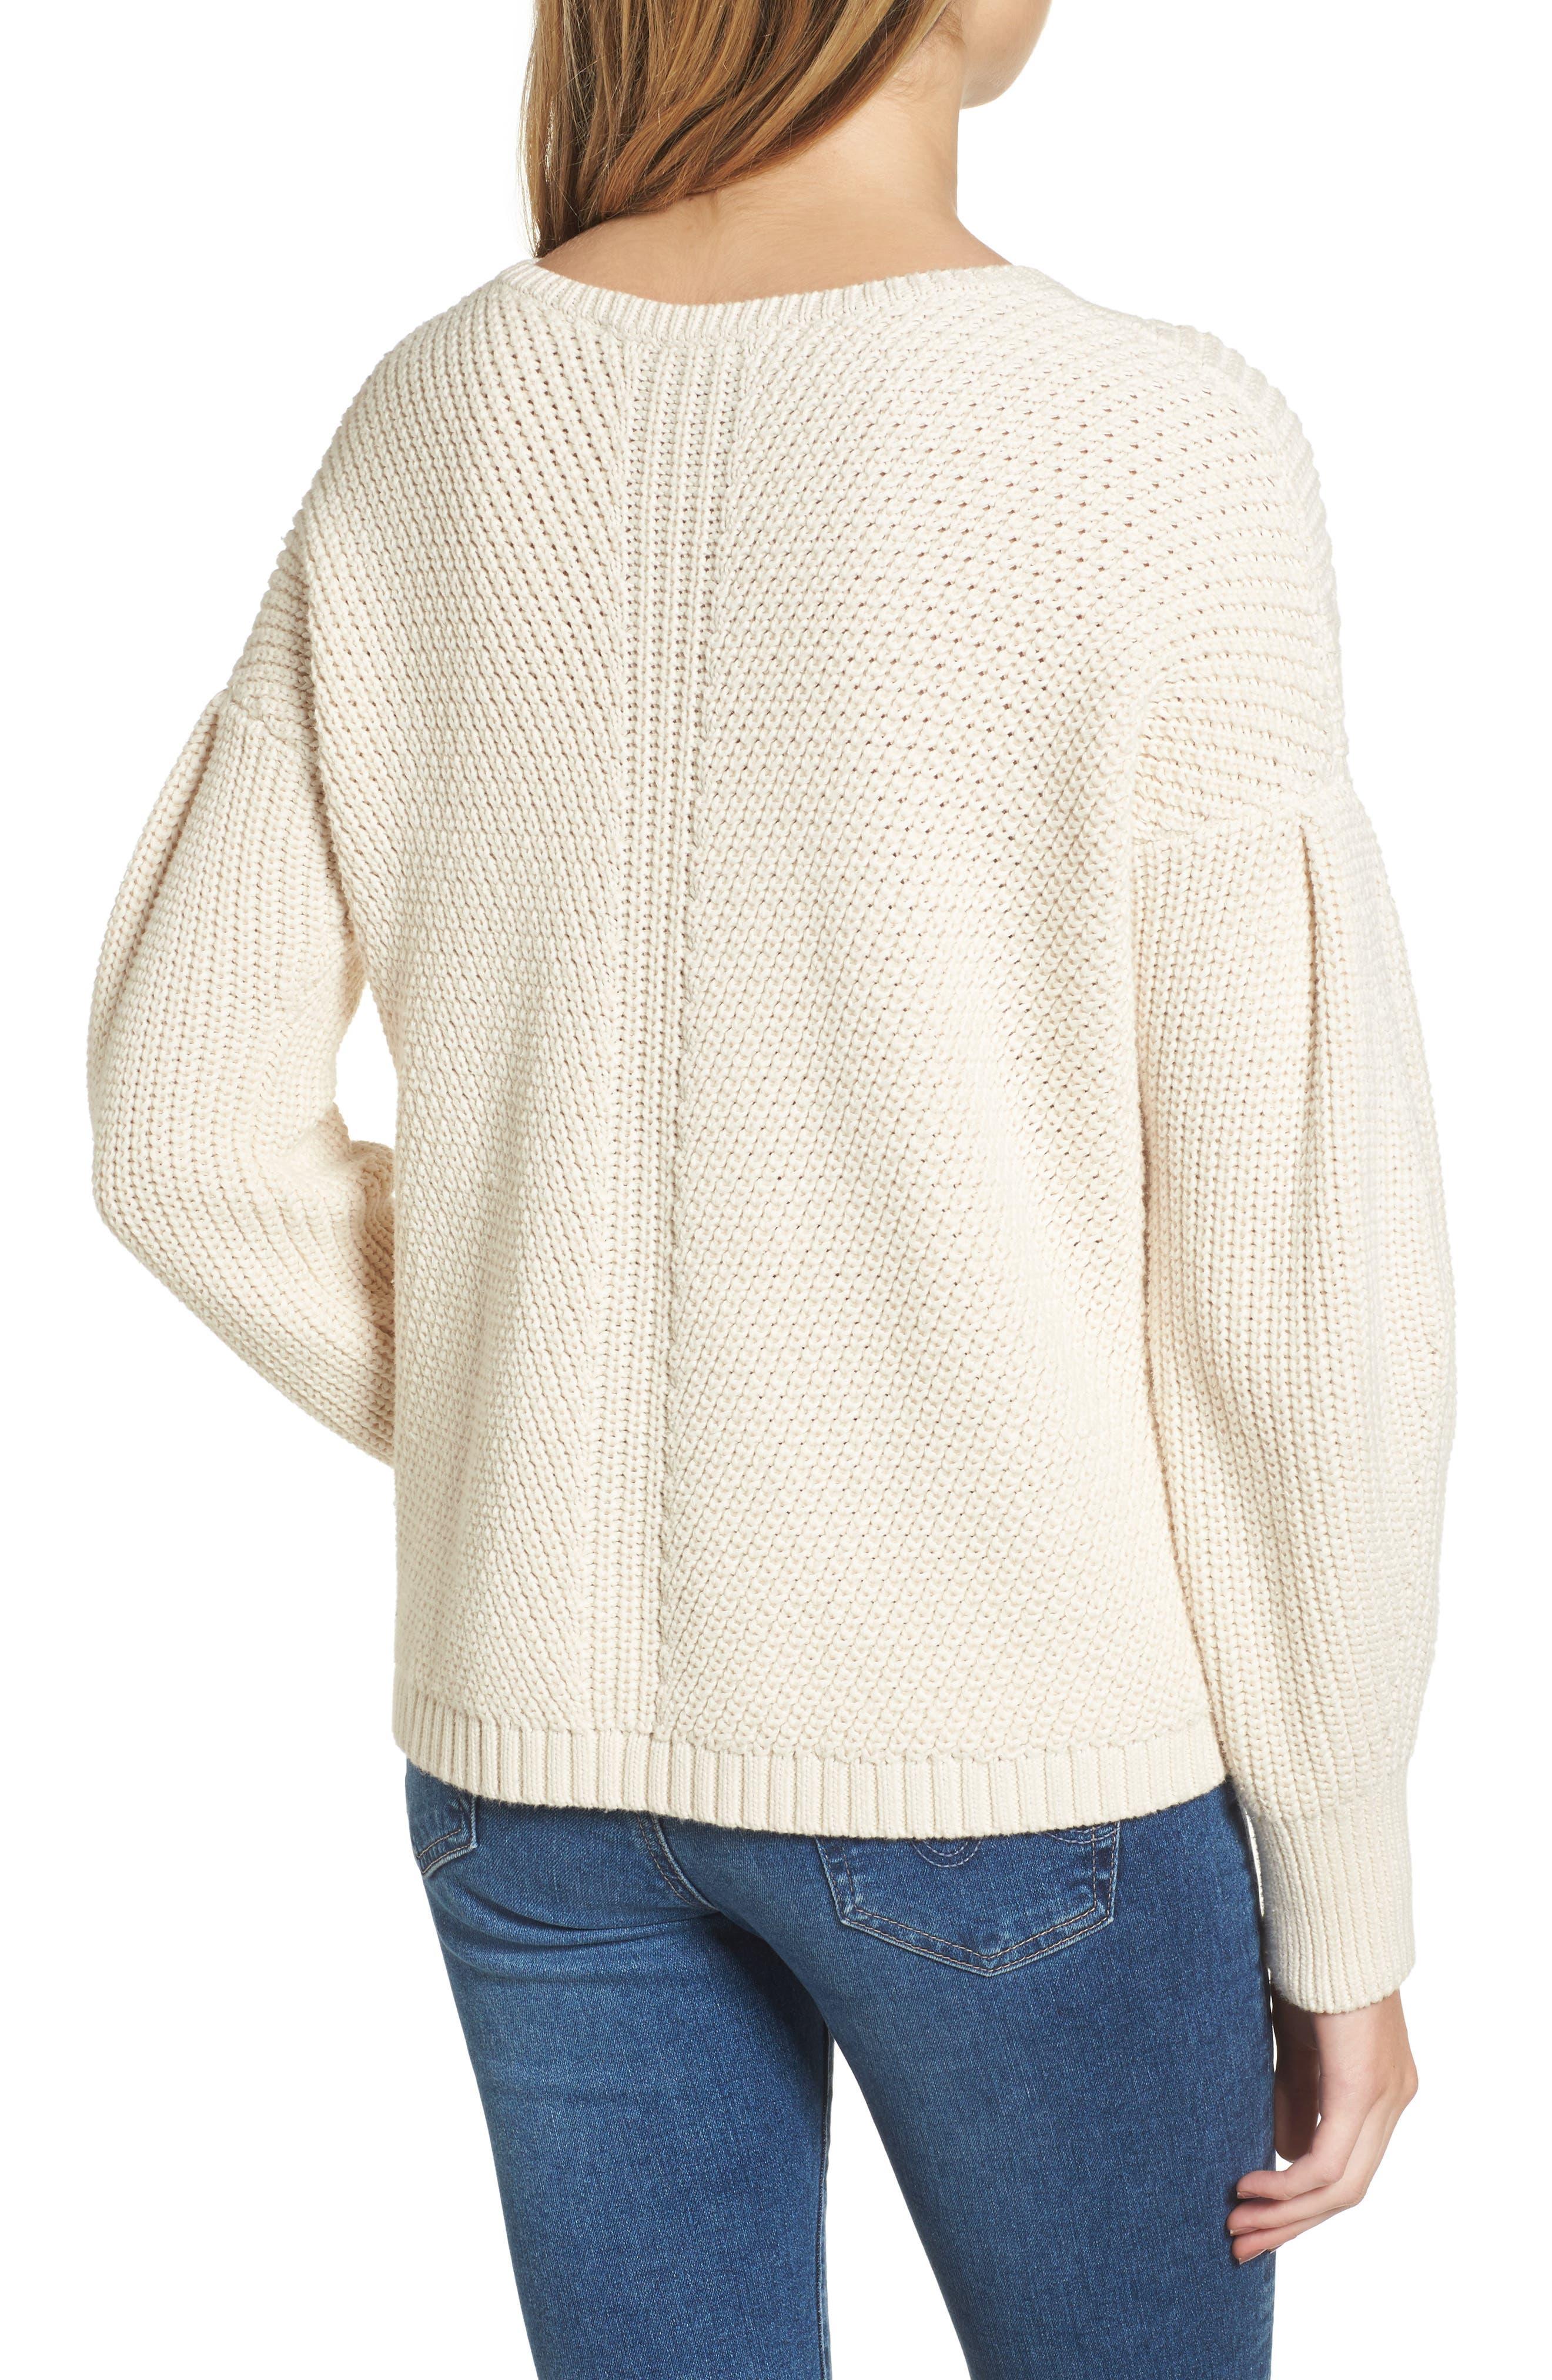 Millie Mozart Sweater,                             Alternate thumbnail 2, color,                             Classic Cream